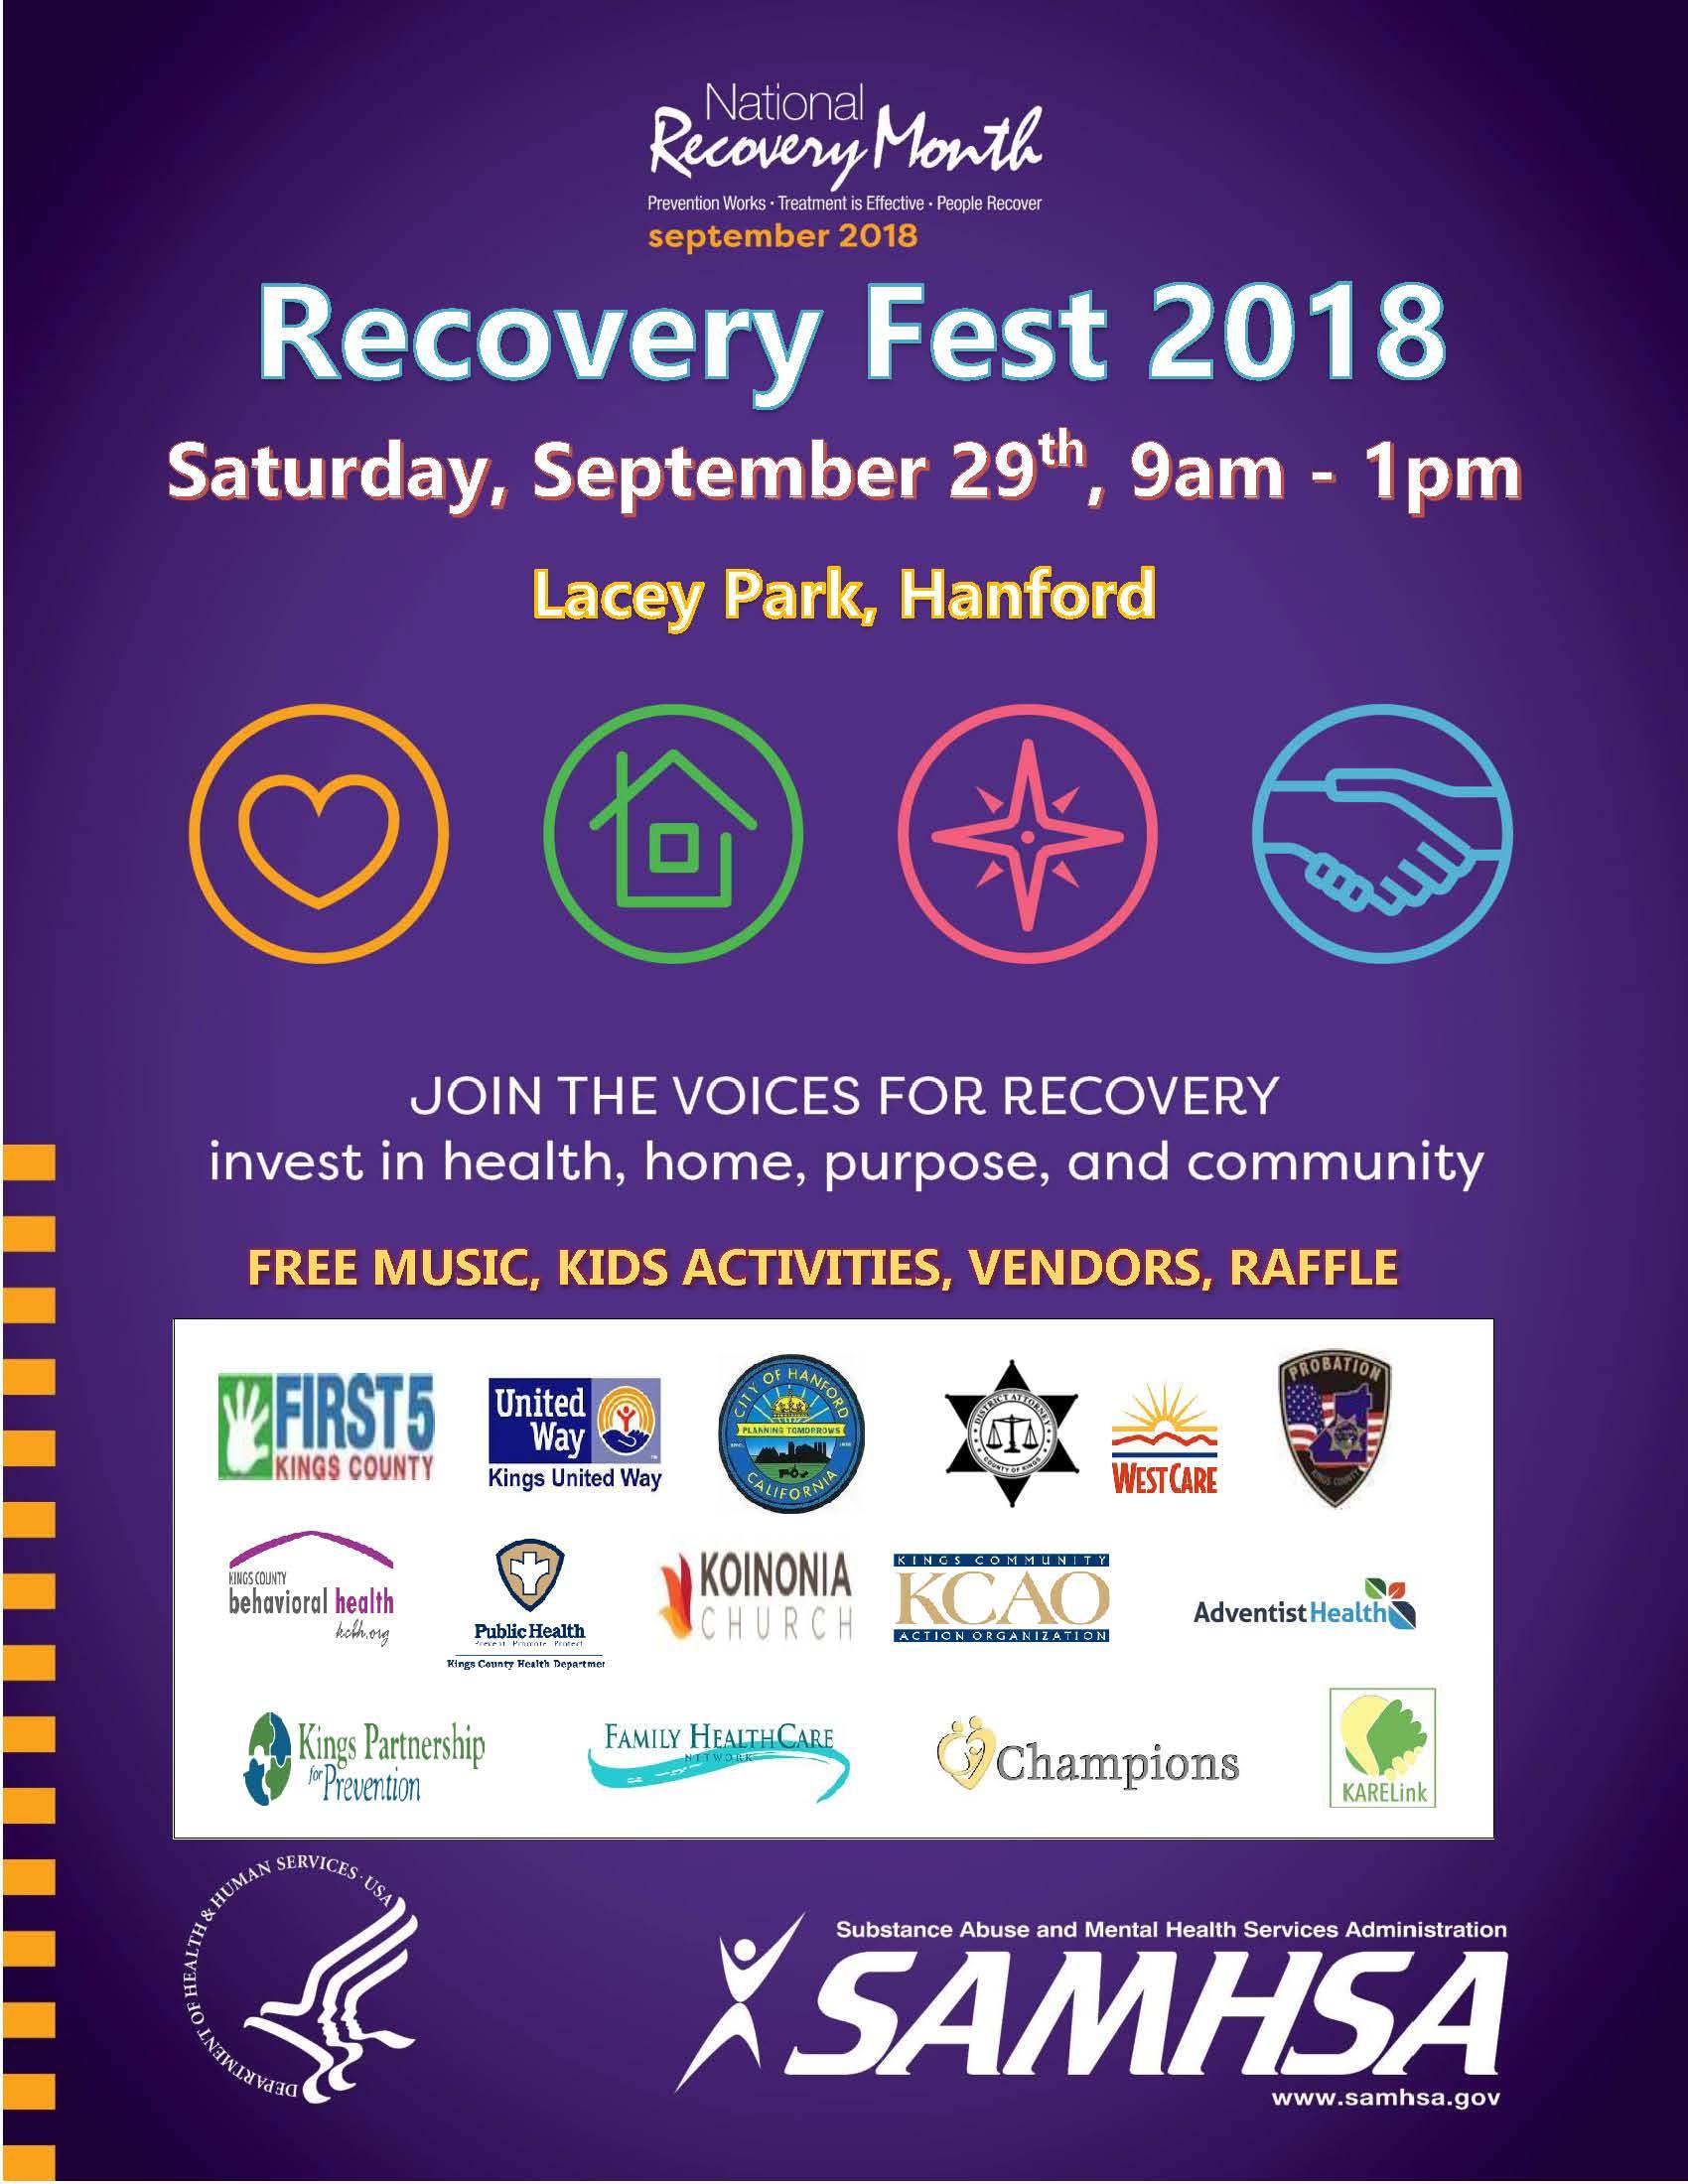 Recovery Fest 2018 Flyer 2.jpg